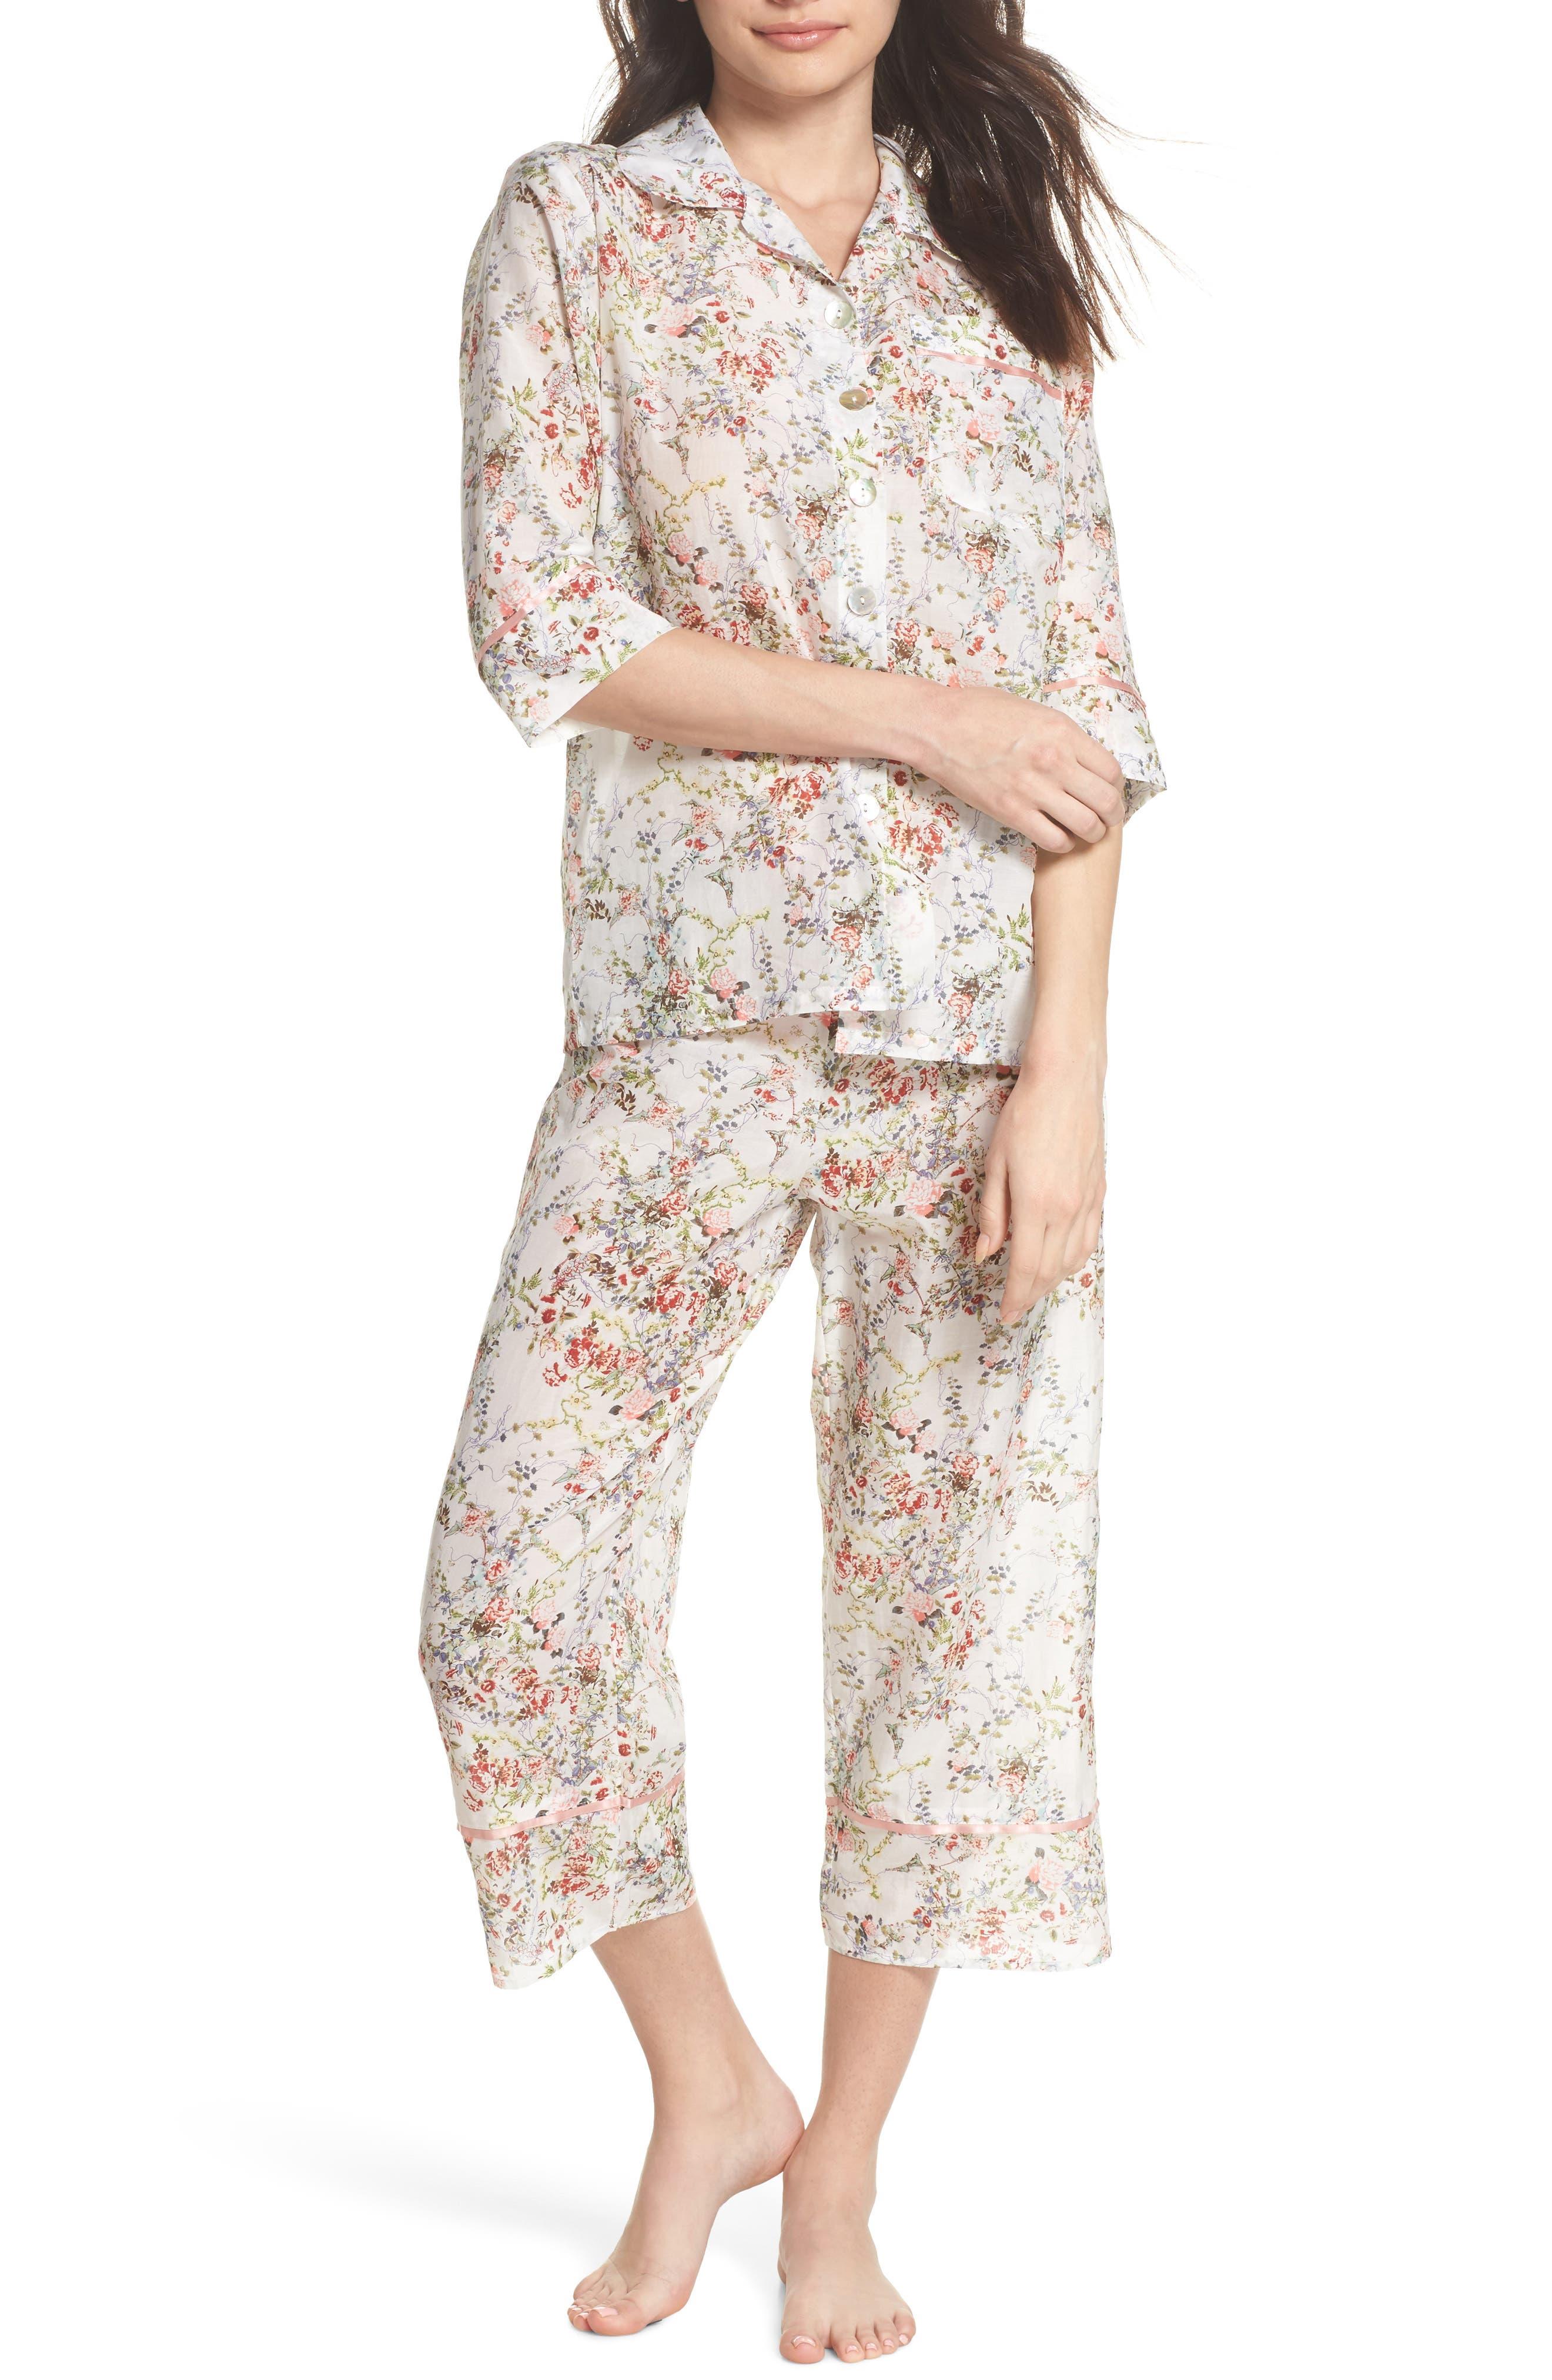 Yolly Floral Cotton & Silk Pajamas,                             Main thumbnail 1, color,                             Ivory Floral